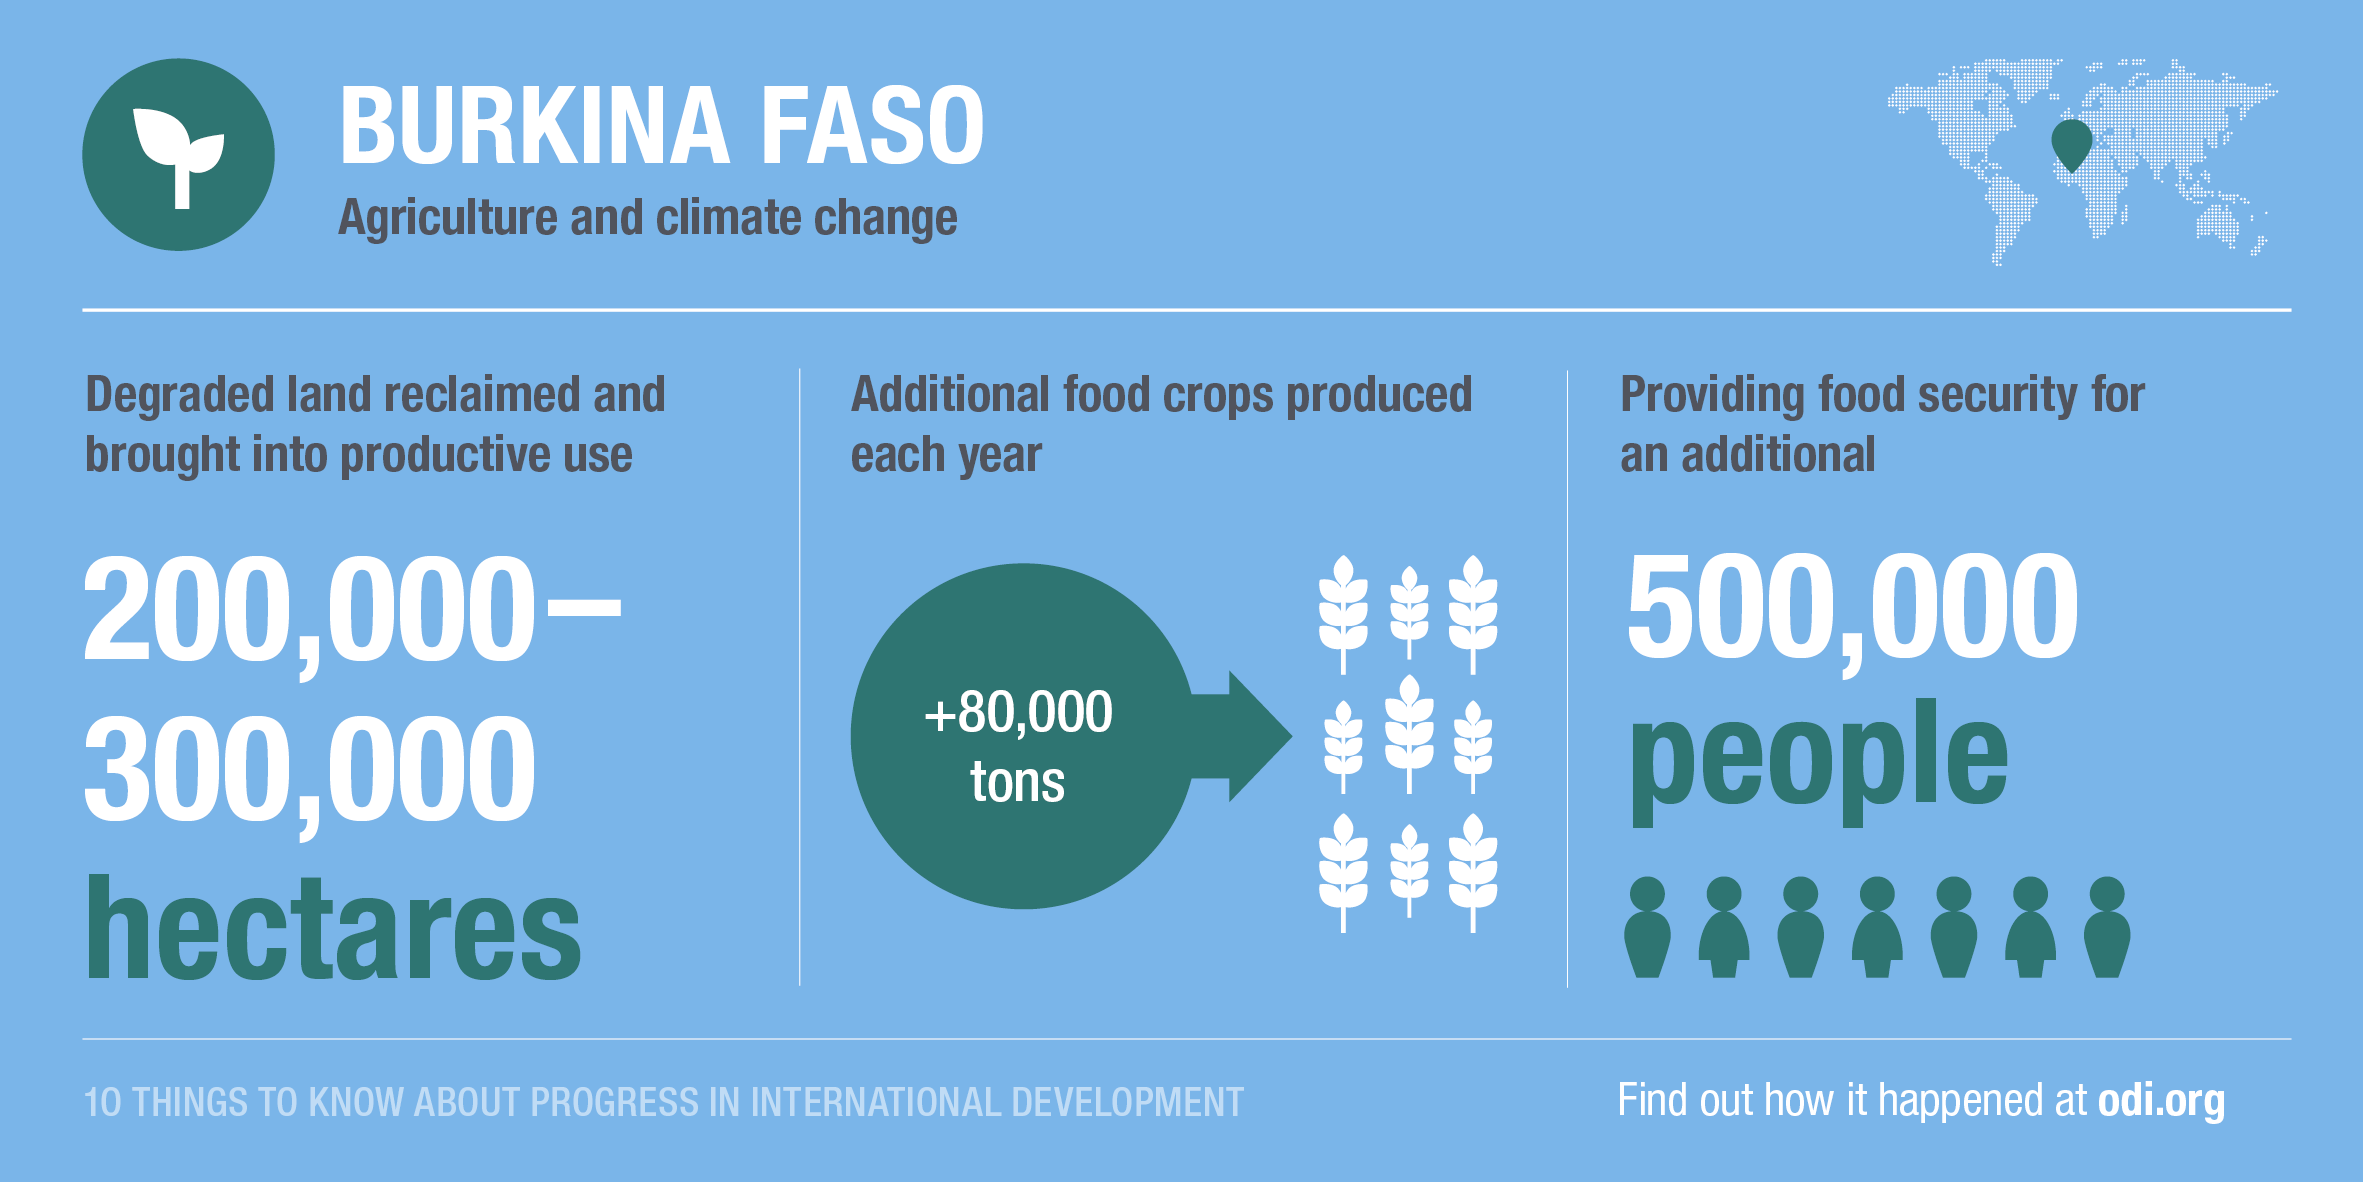 Burkina Faso's progress on agriculture